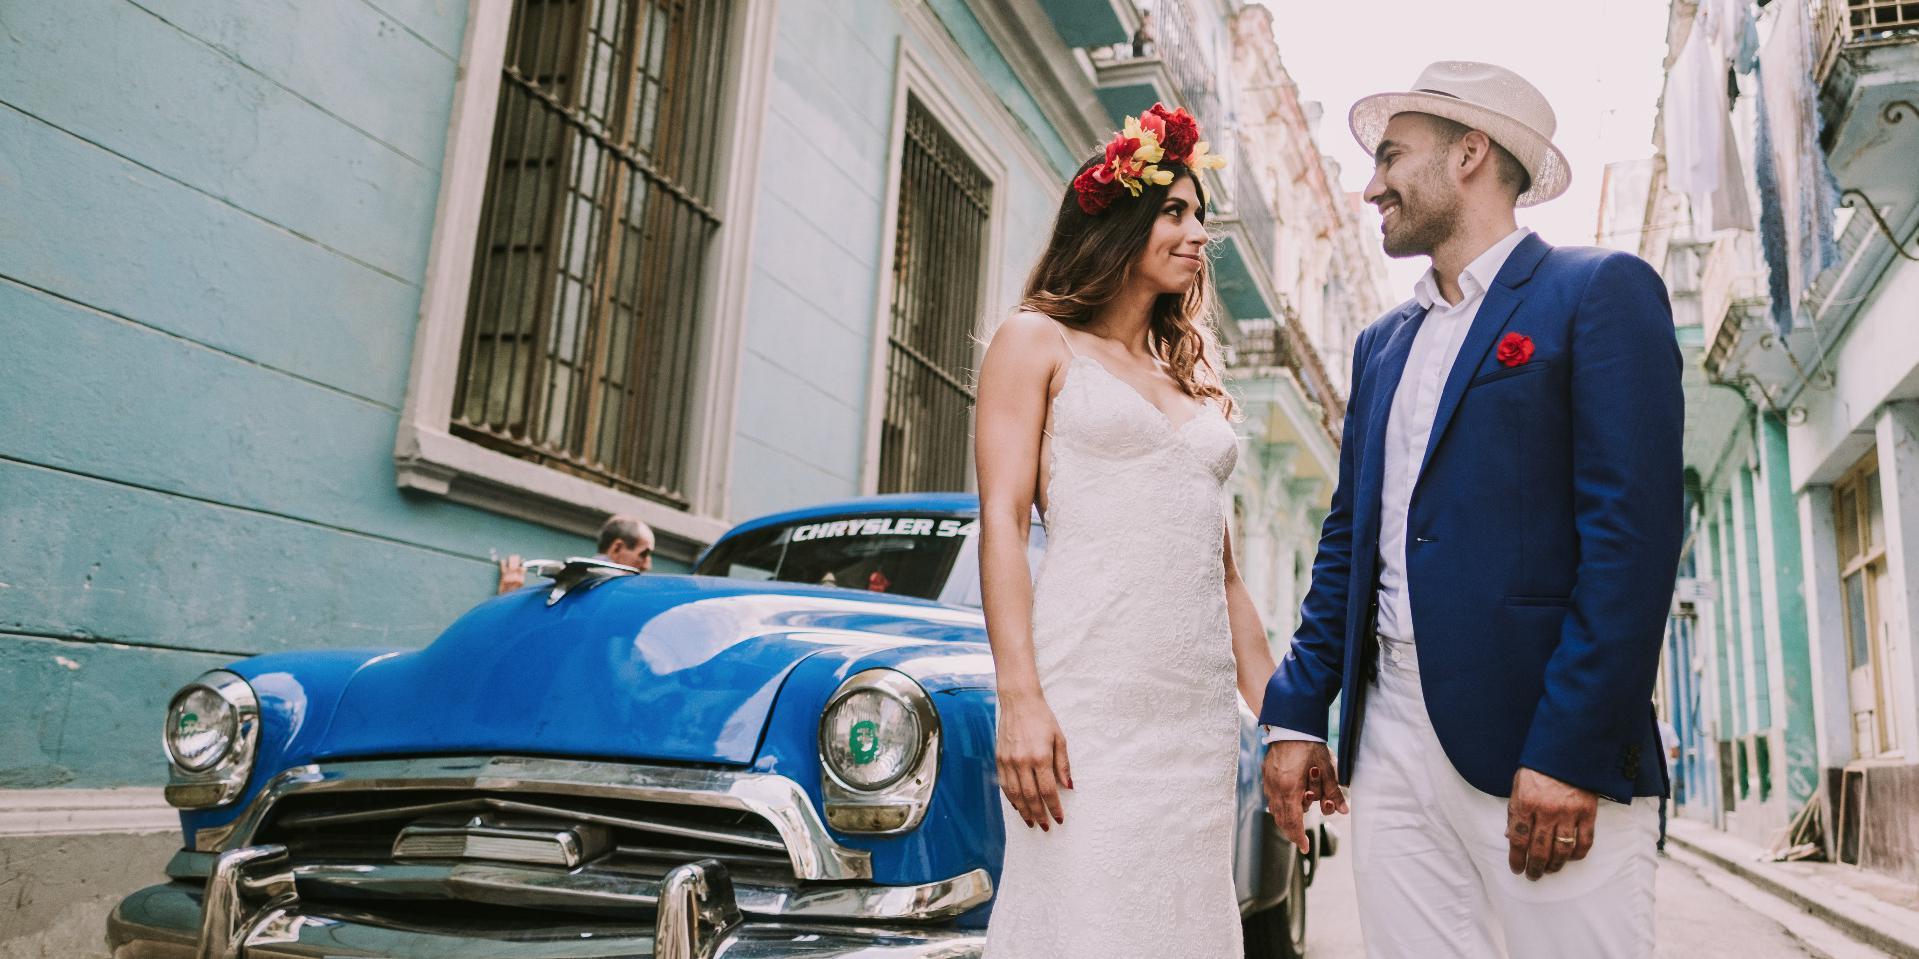 bodas-sin-clasificar-sin-tema-cuba-28871.jpg